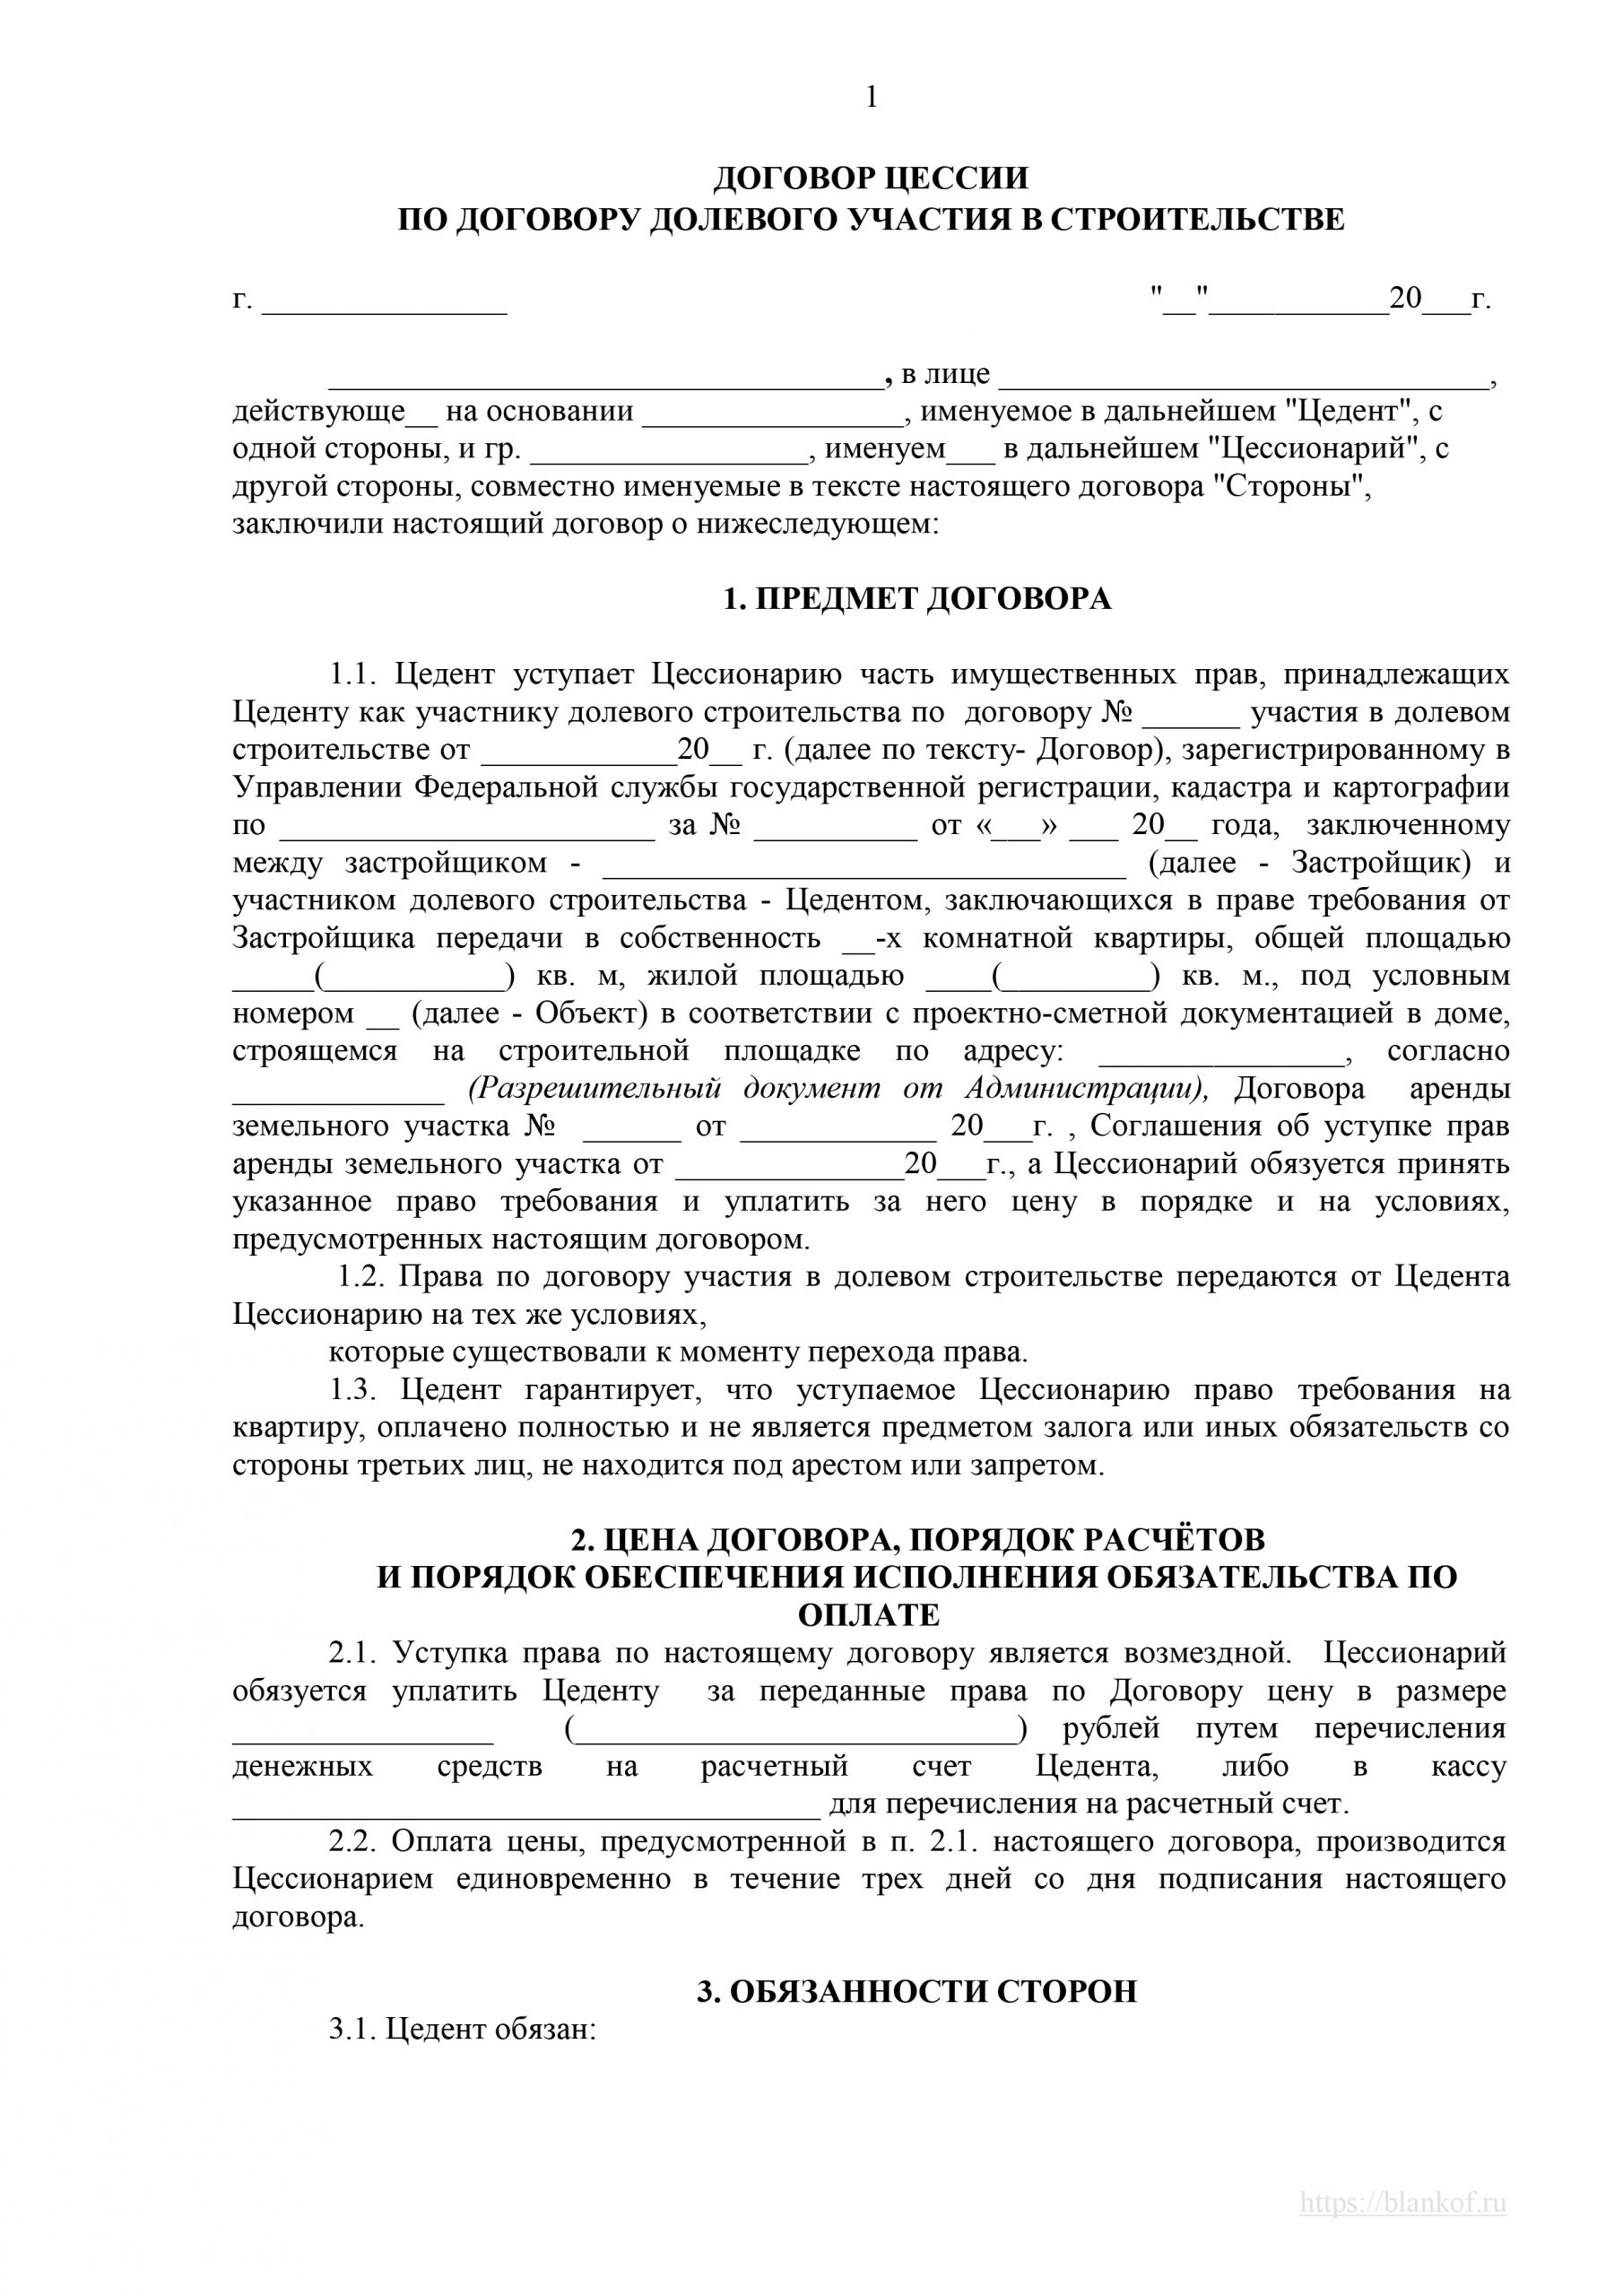 договор уступки прав по договору займа